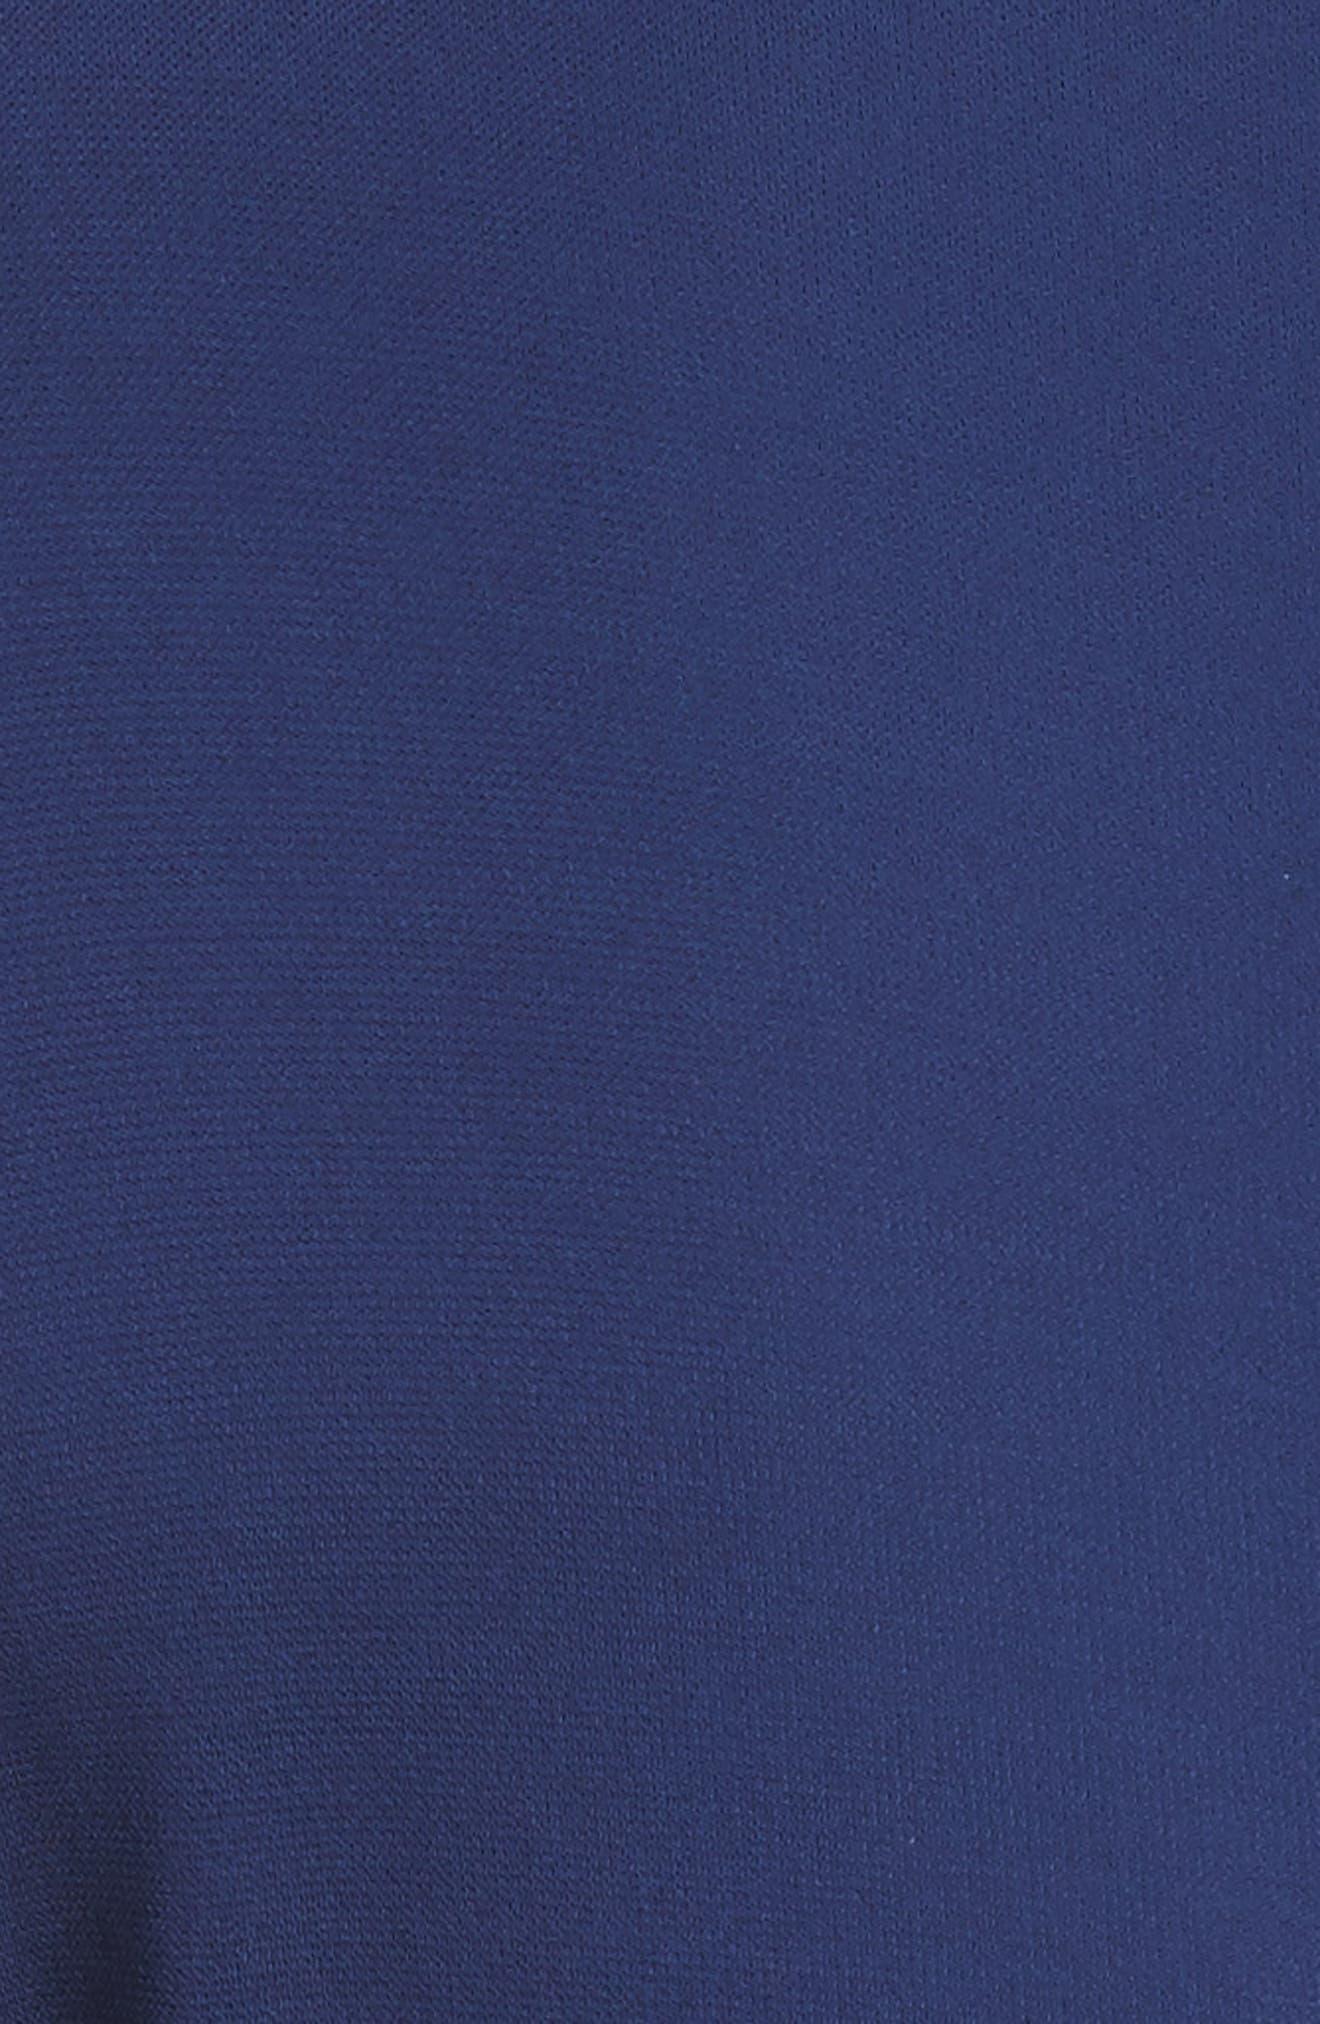 Cascade Sleeve Sheath Dress,                             Alternate thumbnail 6, color,                             Sapphire